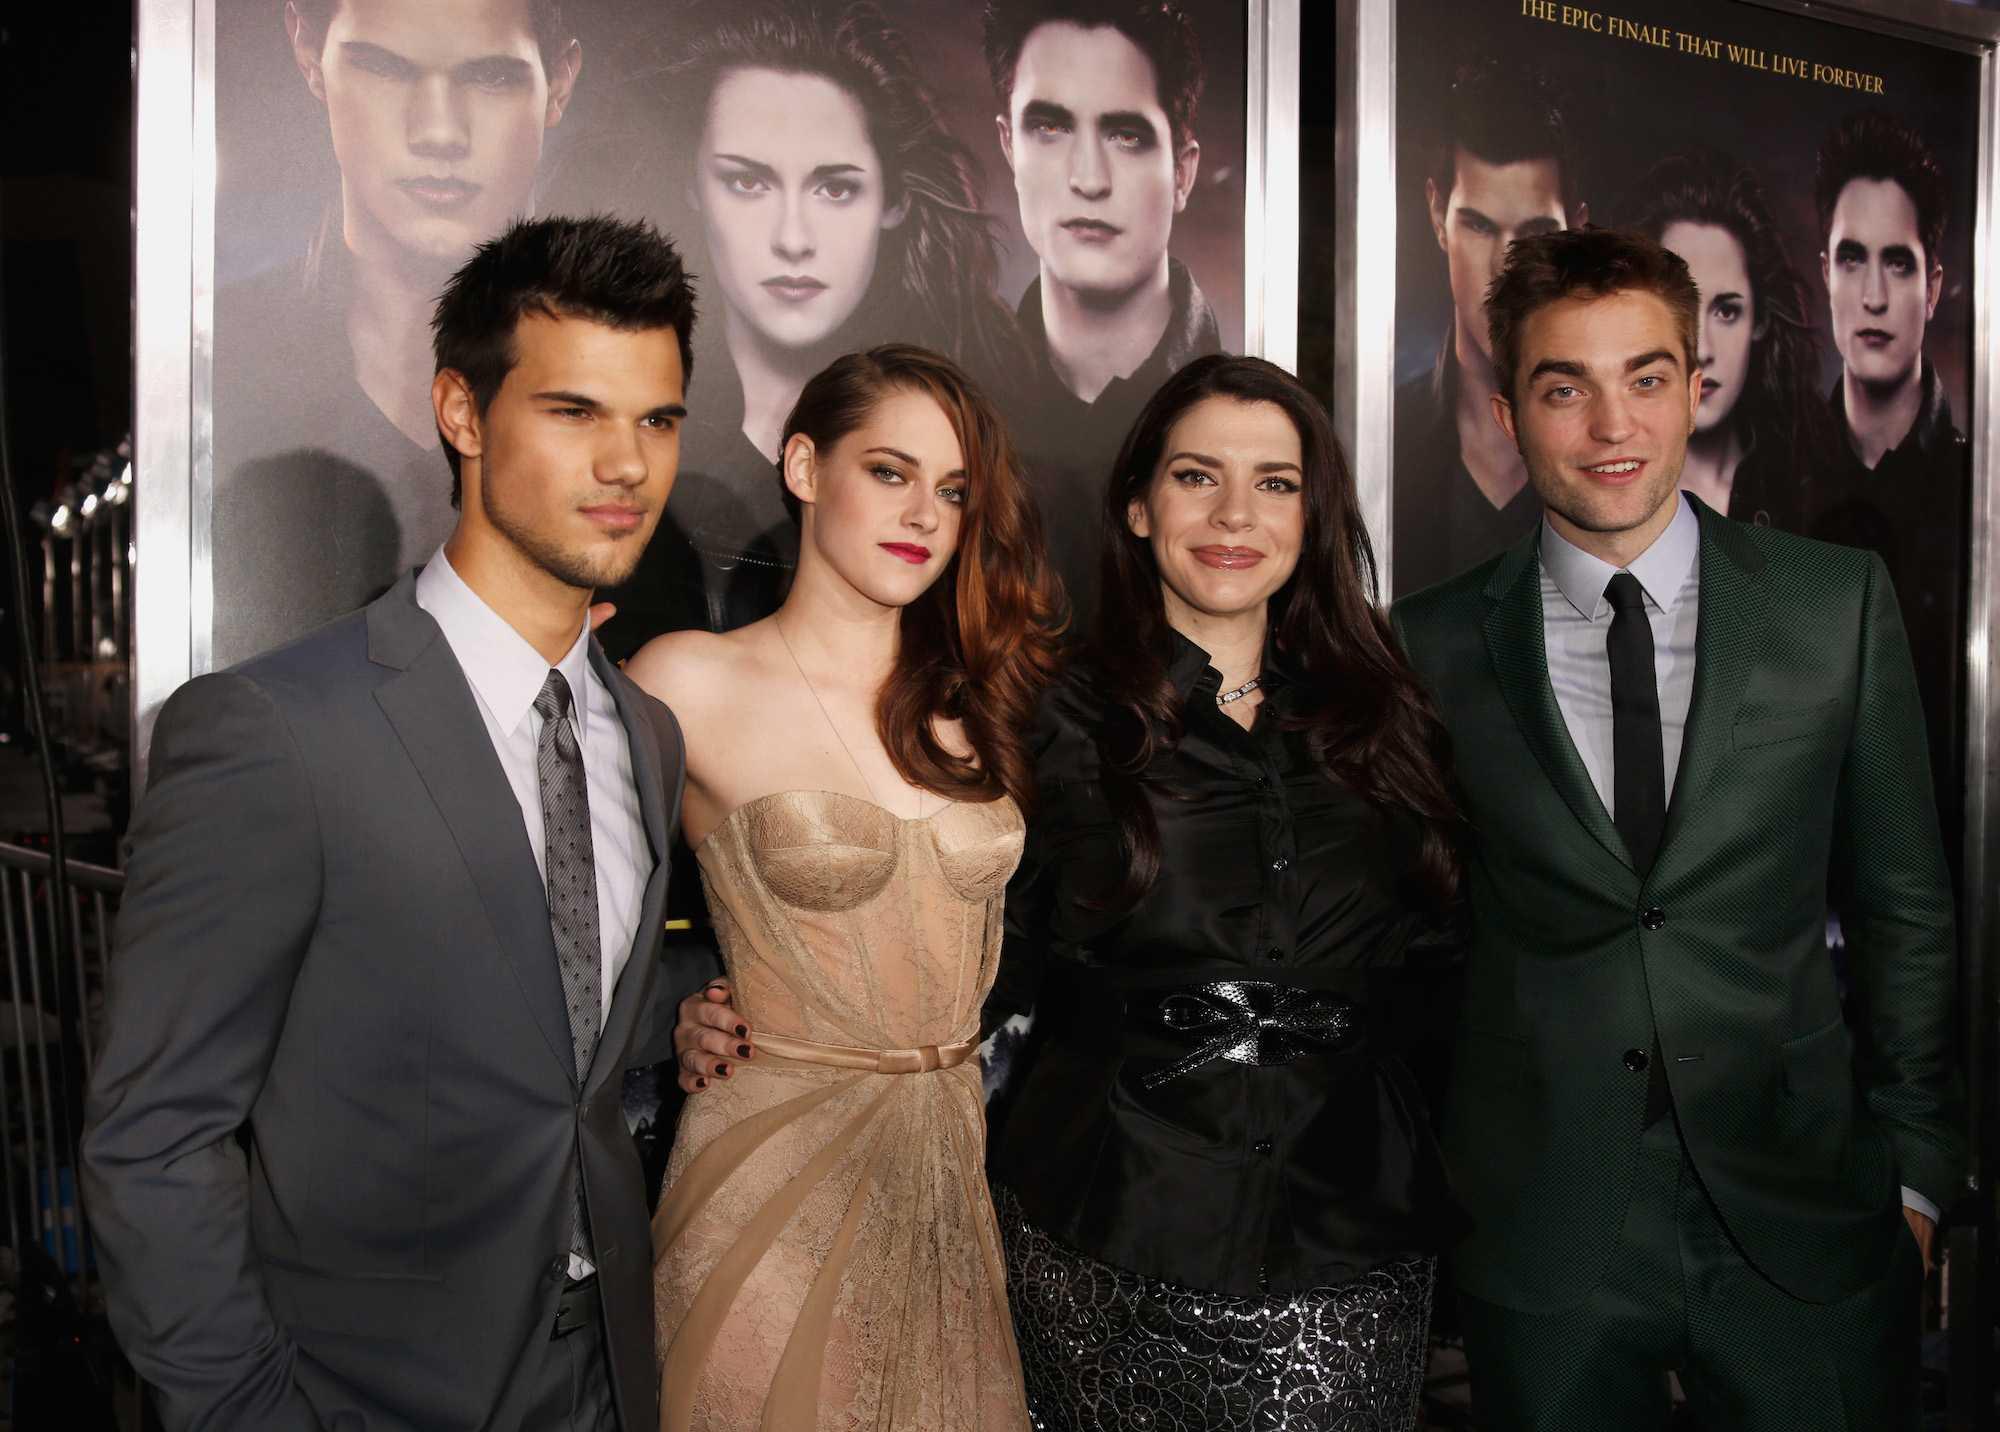 Taylor Lautner, Kristen Stewart, Stephenie Meyer et Robert Pattinson à 'The Twilight Saga: Breaking Dawn - Part 2' Los Angeles premiere le 12 novembre 2012